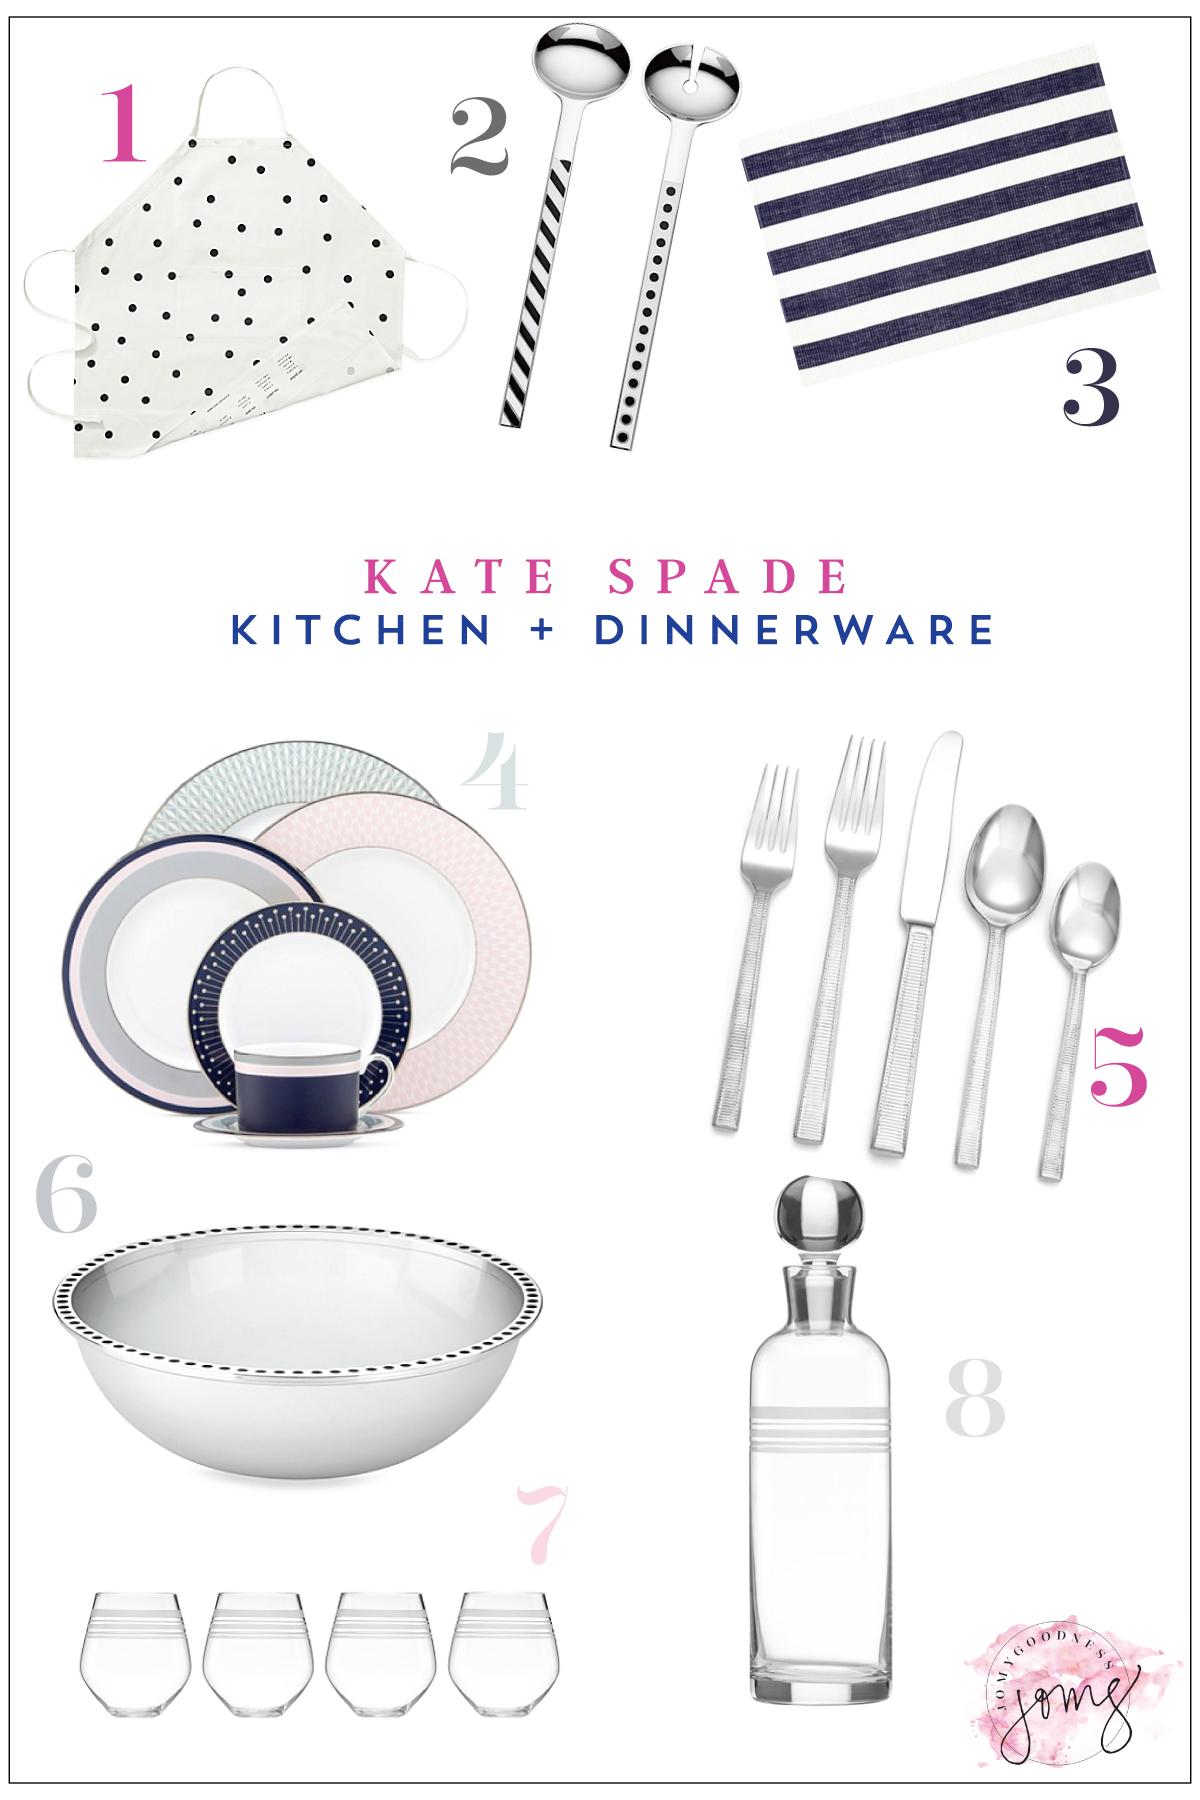 york diner for kate towel eat brand spade cake home zi vivid stripe new breakfast kitchen snapdragon